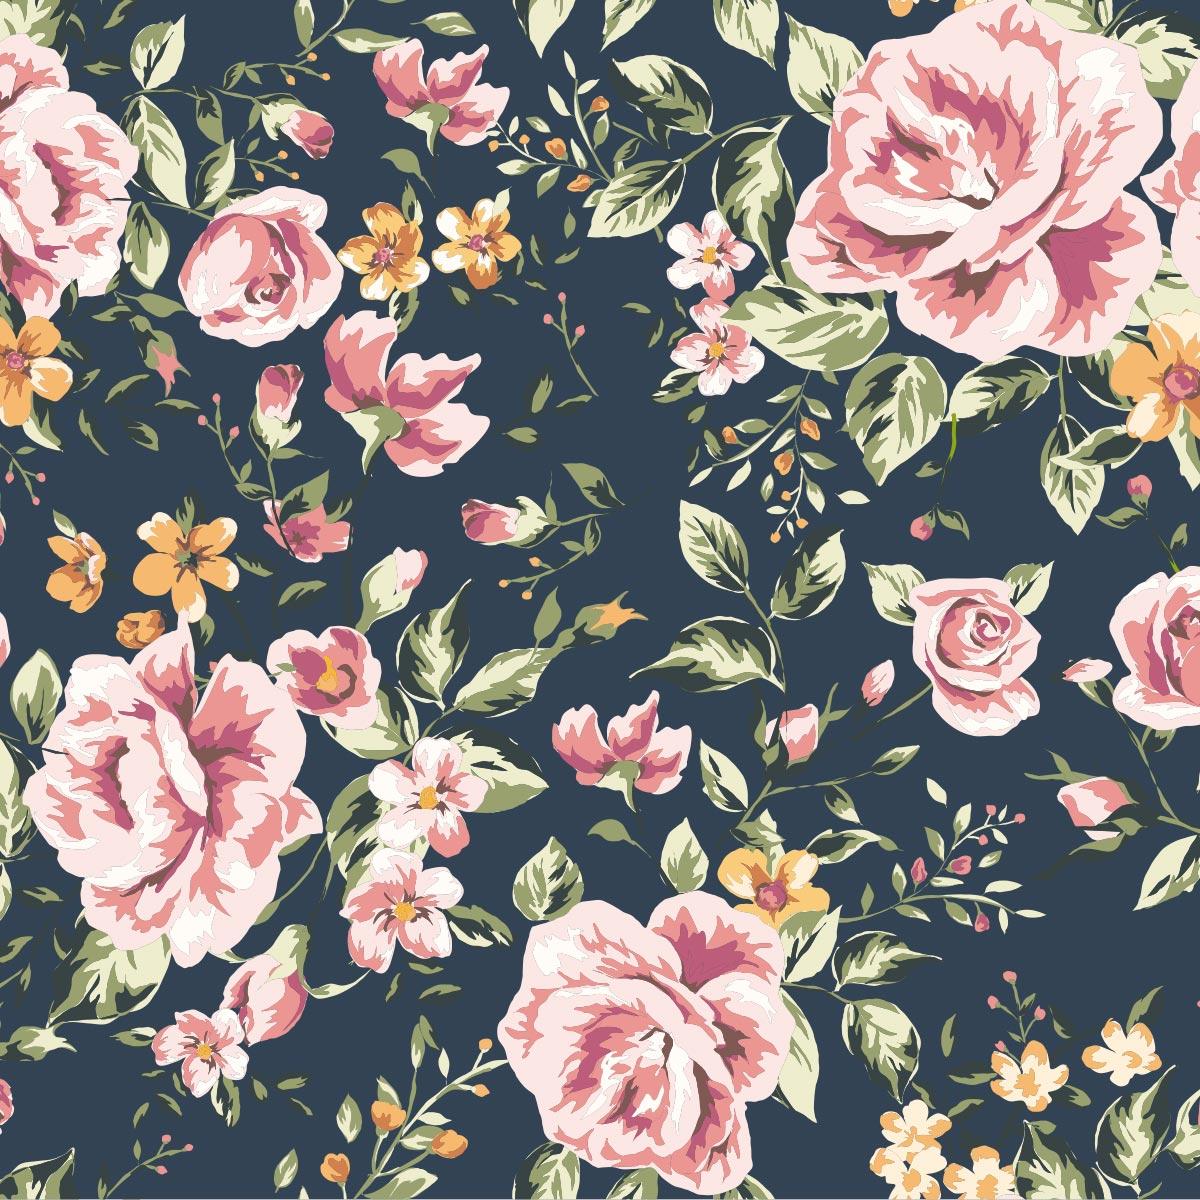 Papel de Parede Floral Flores Rosas Glamour Adesivo